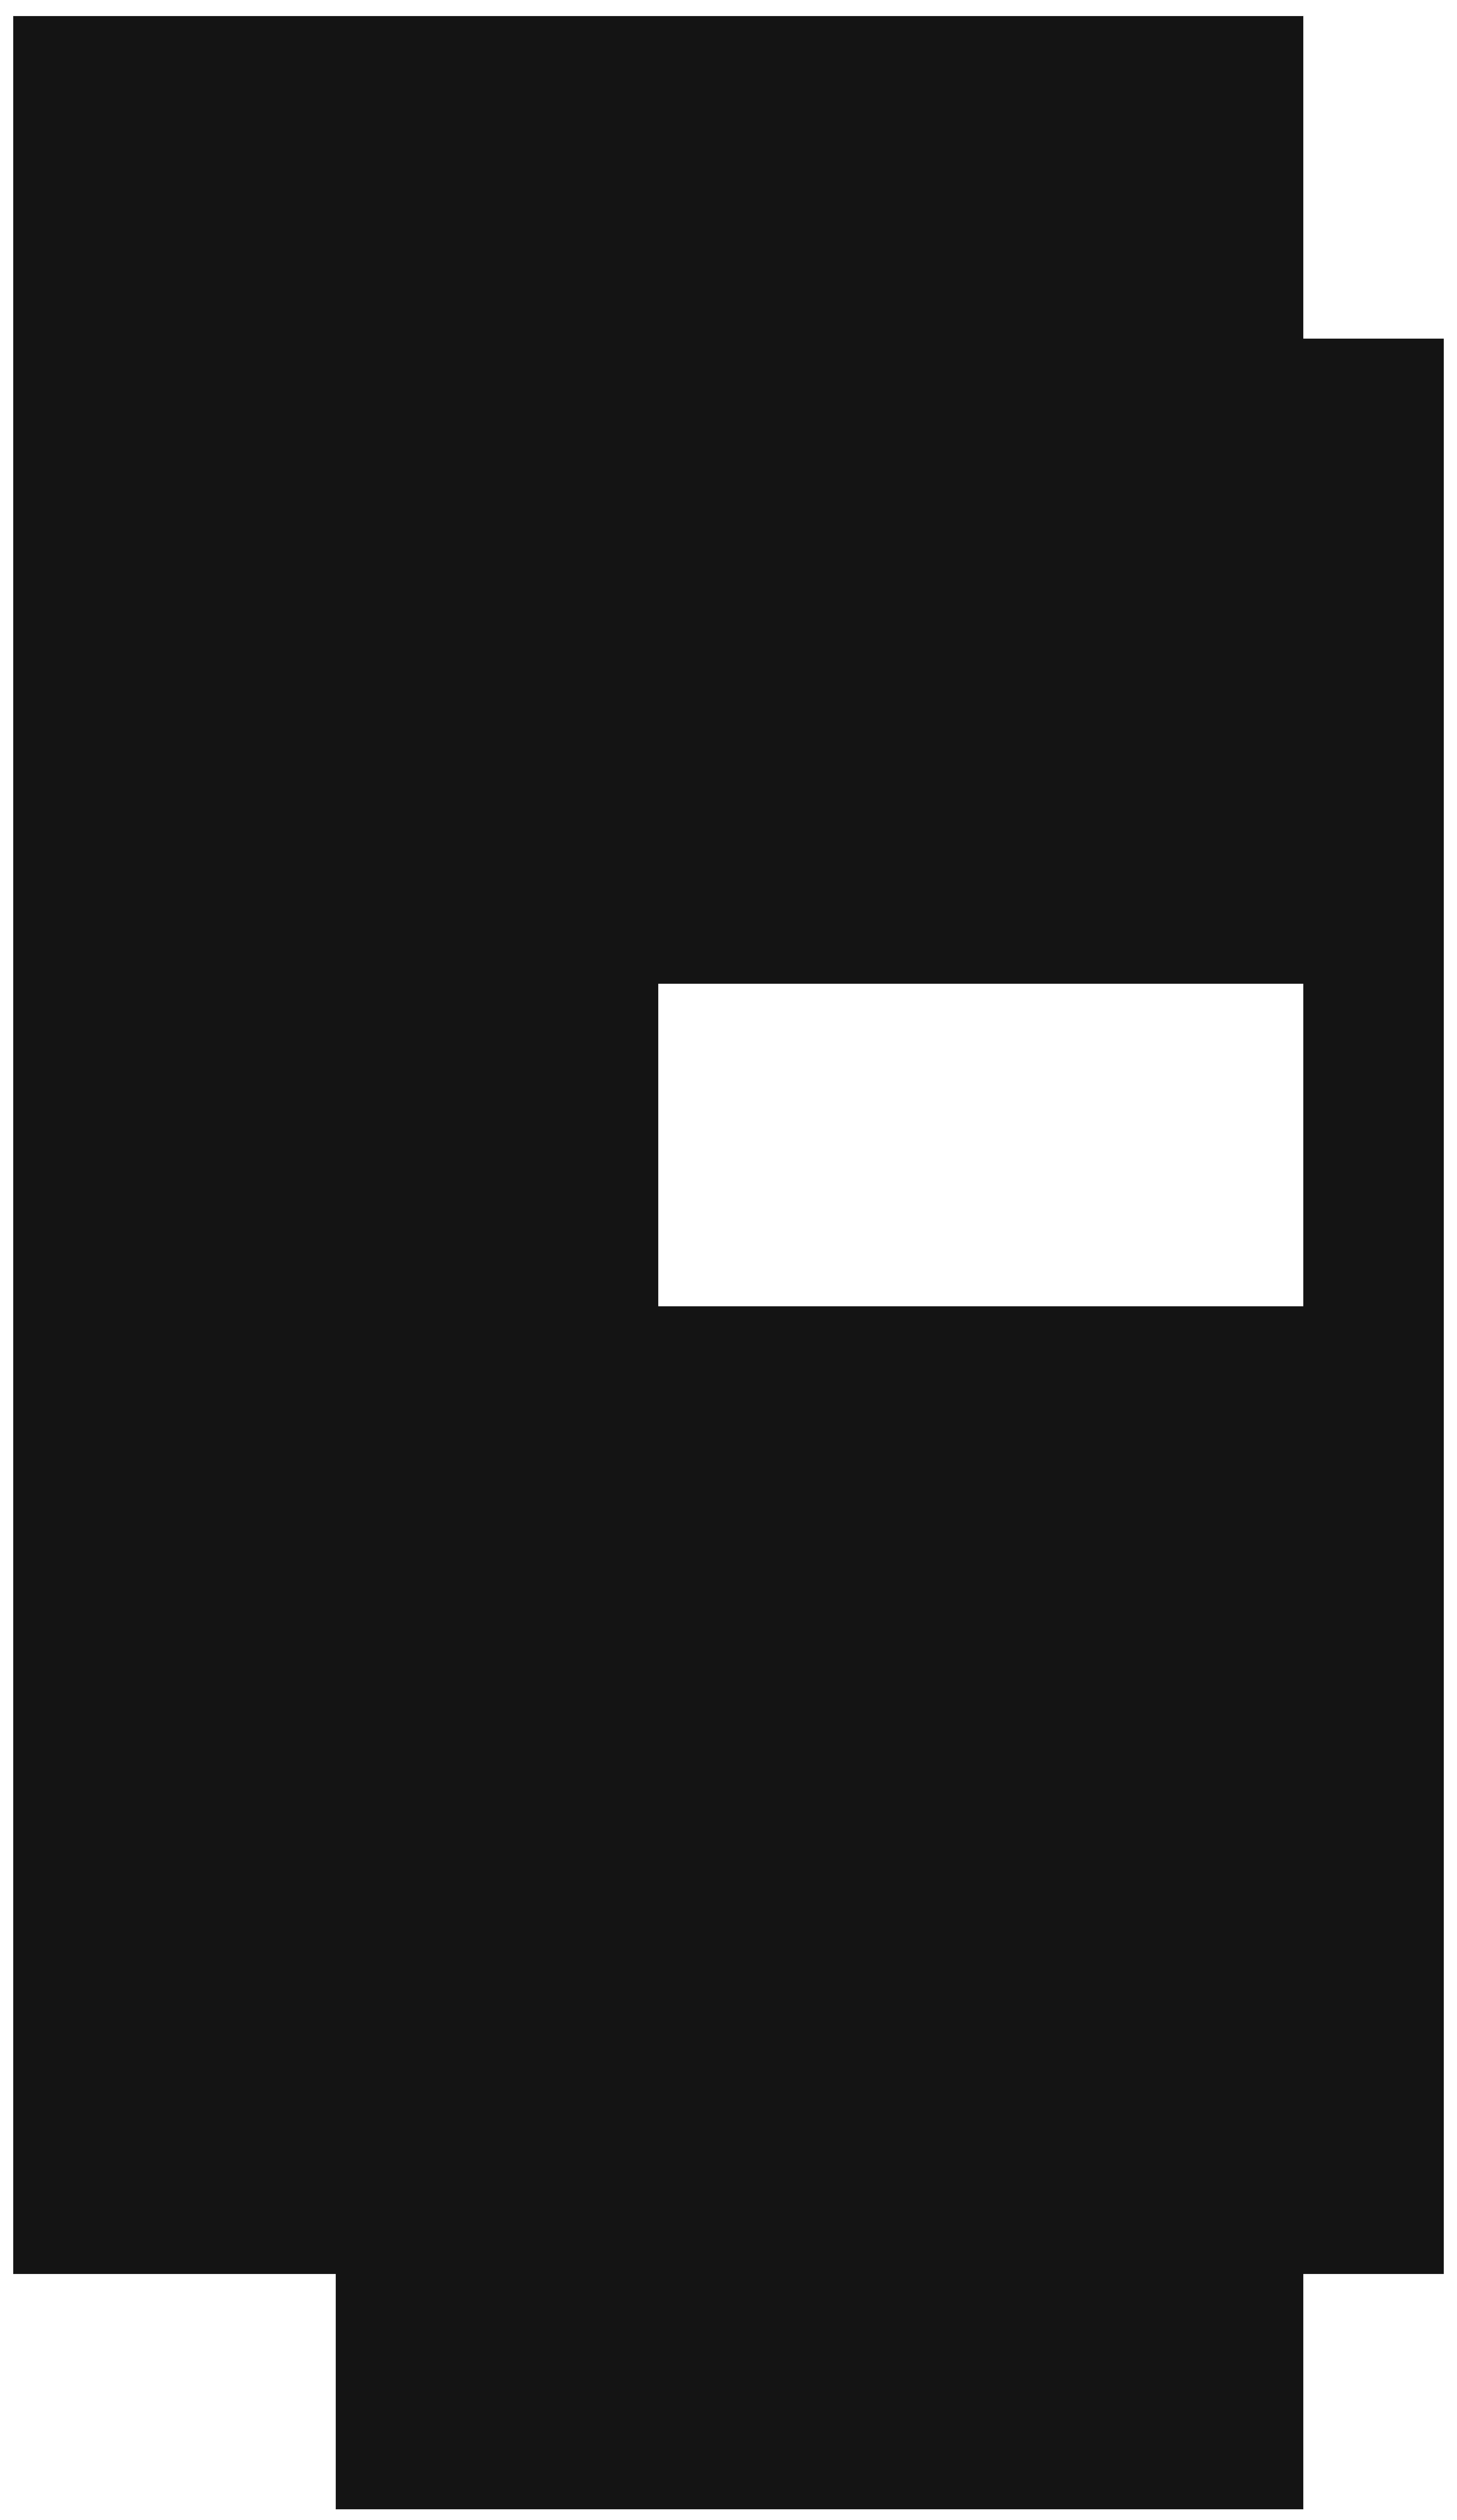 Silhouette Beard Moustache Clip art.